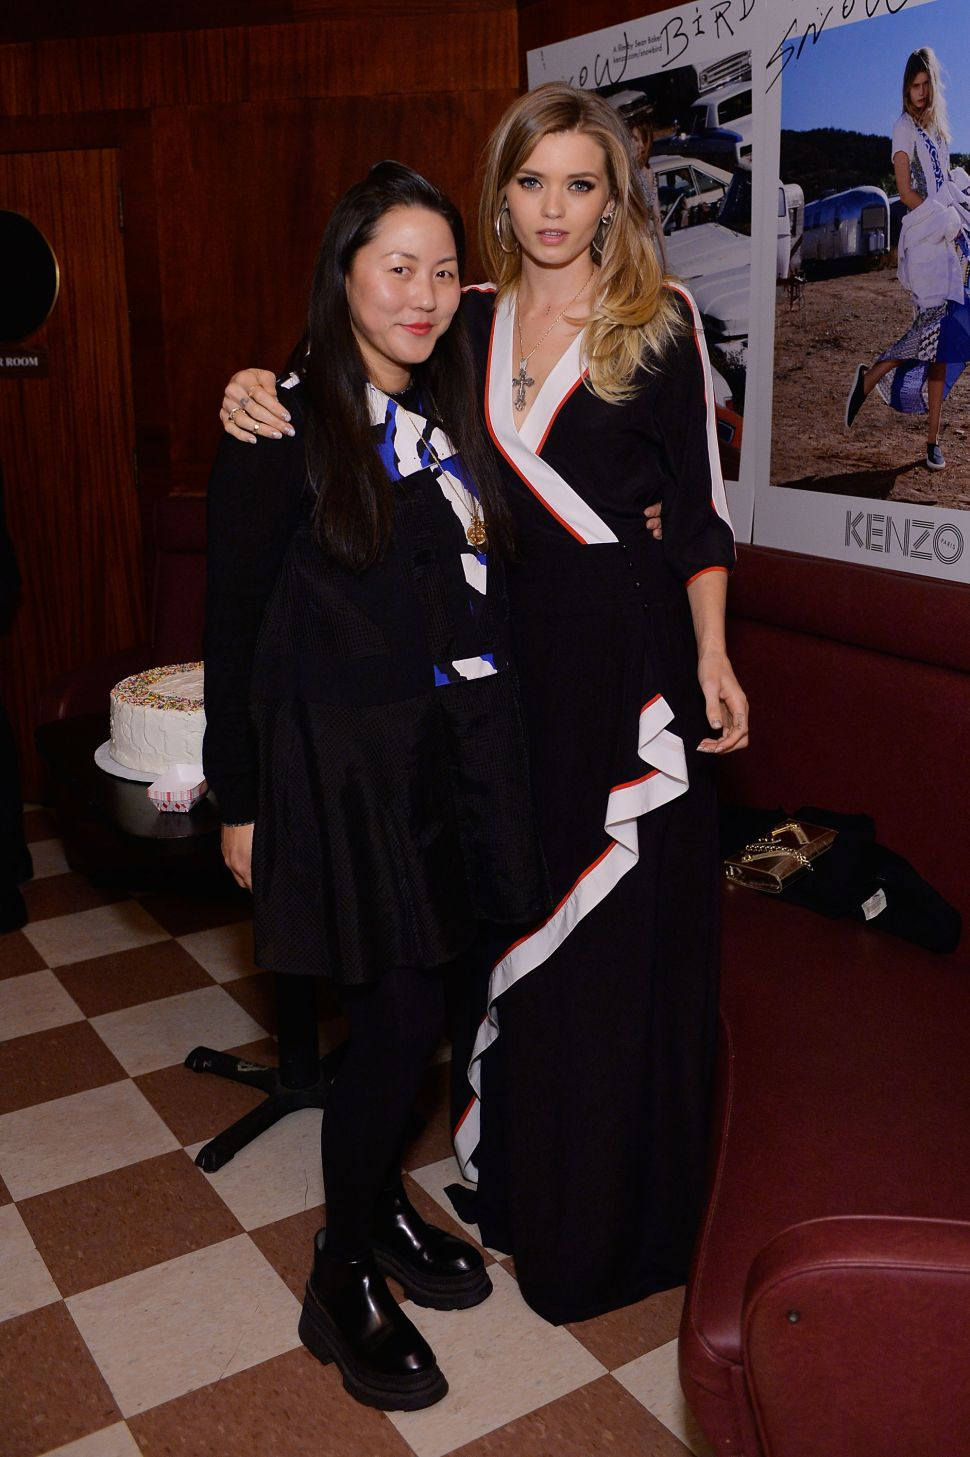 Fashion Film Face Off: Kenzo vs. 10 Crosby Derek Lam